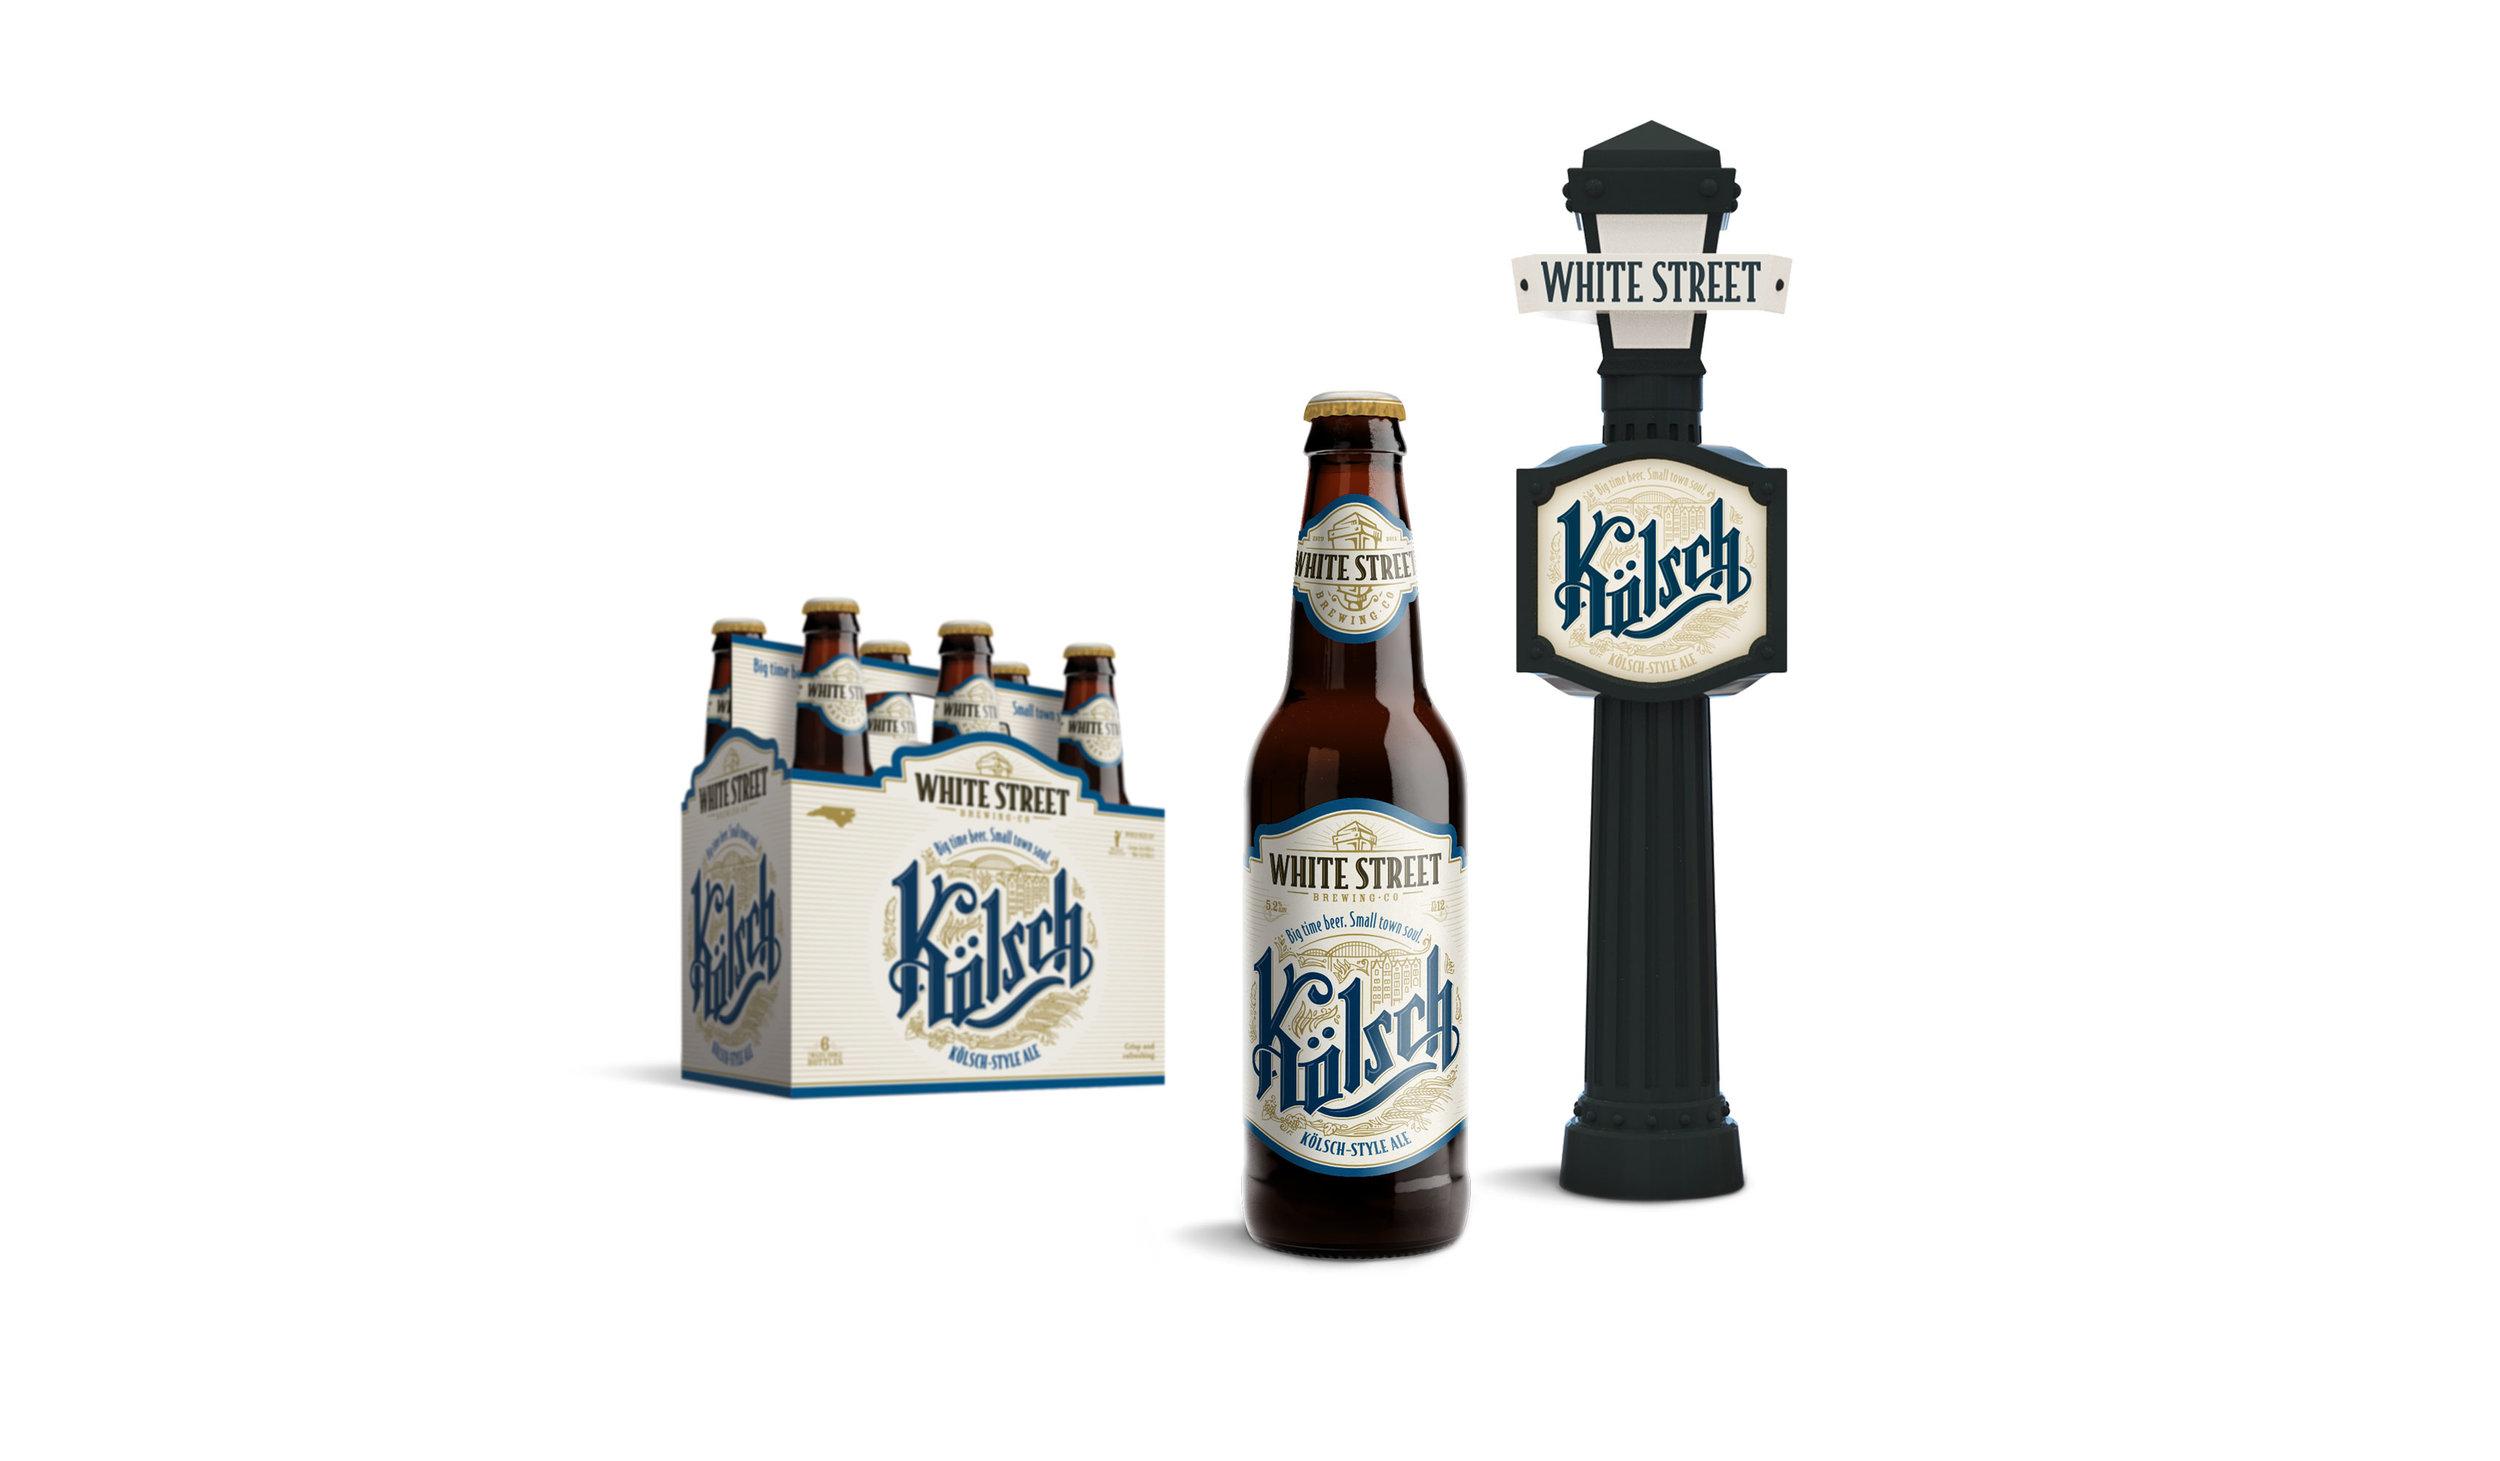 Craft-Beer-Branding-White-Street-Brewing-Co-Kolsch-Product-Design.jpg